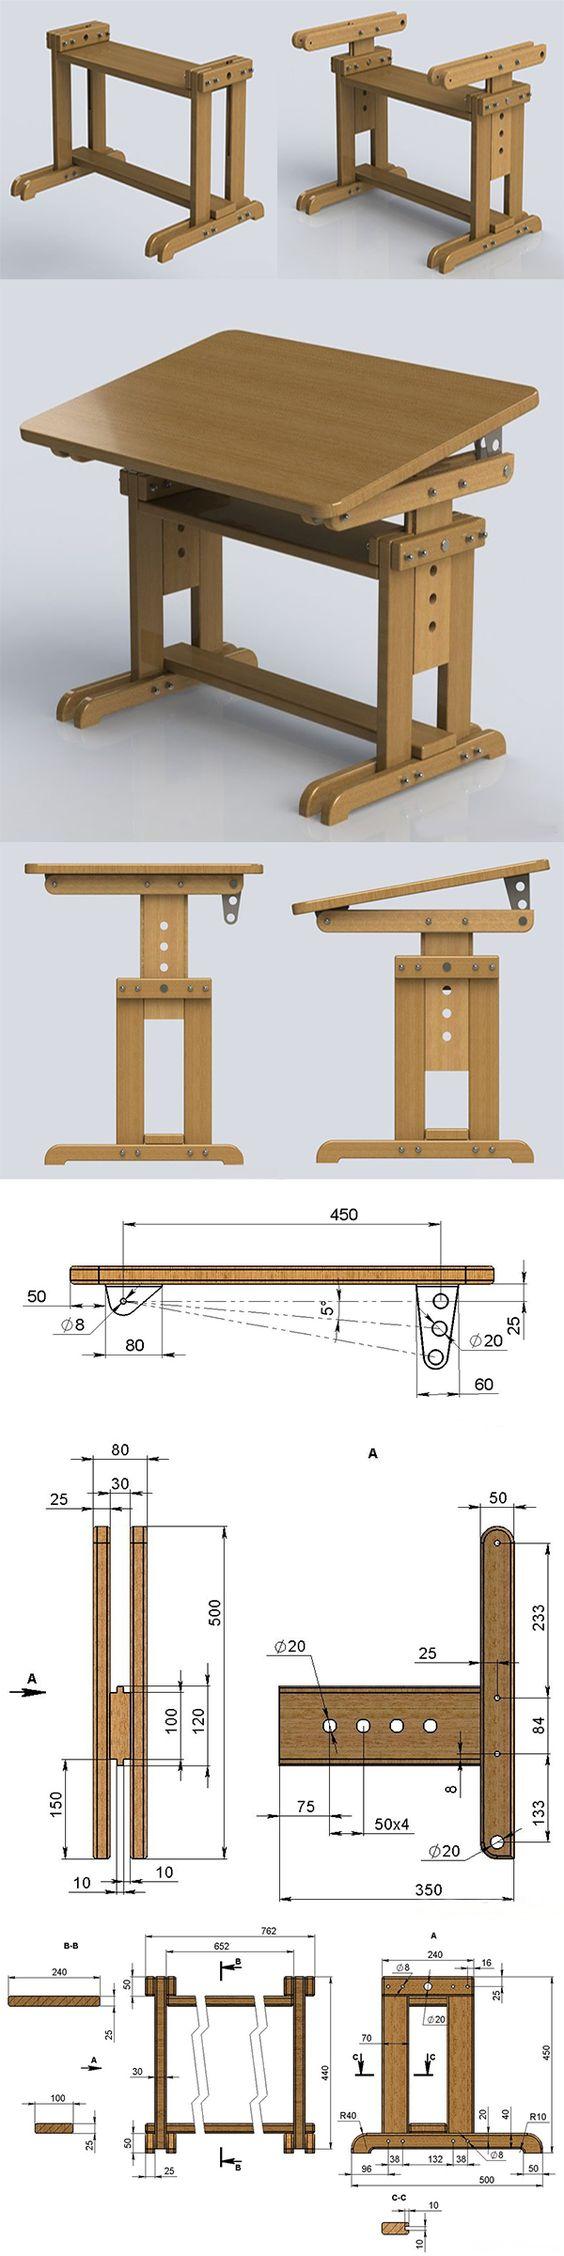 Plano de trabajo dibujo ideas pinterest dibujos for Planos de carpinteria de madera